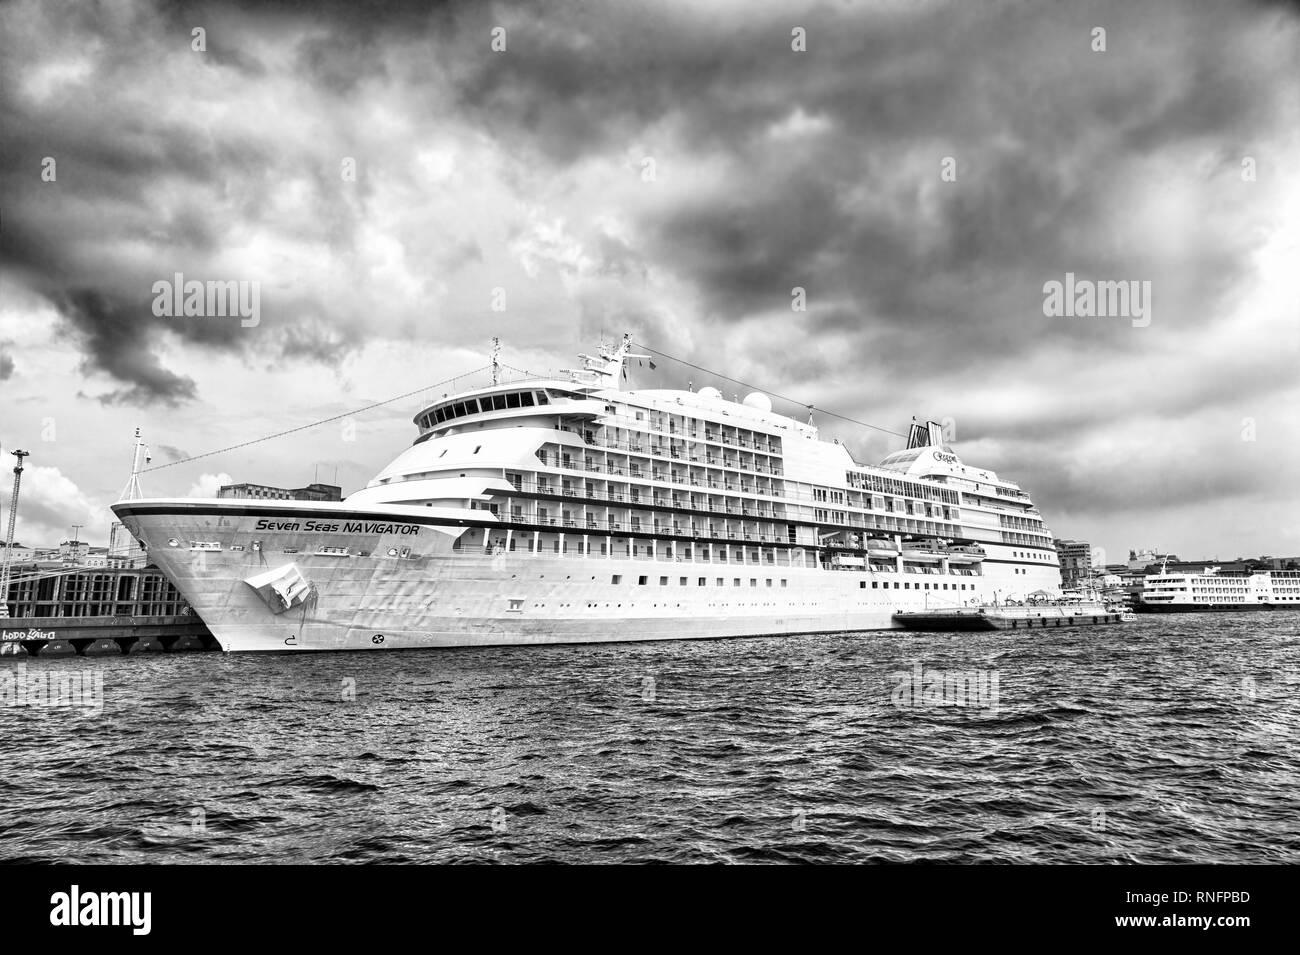 Santarem, Brazil-December 24, 2015: Large luxury cruise ship Seven Seas Navigator anchored at sea at the port of Santarem, Brazil at cloudy day - Stock Image